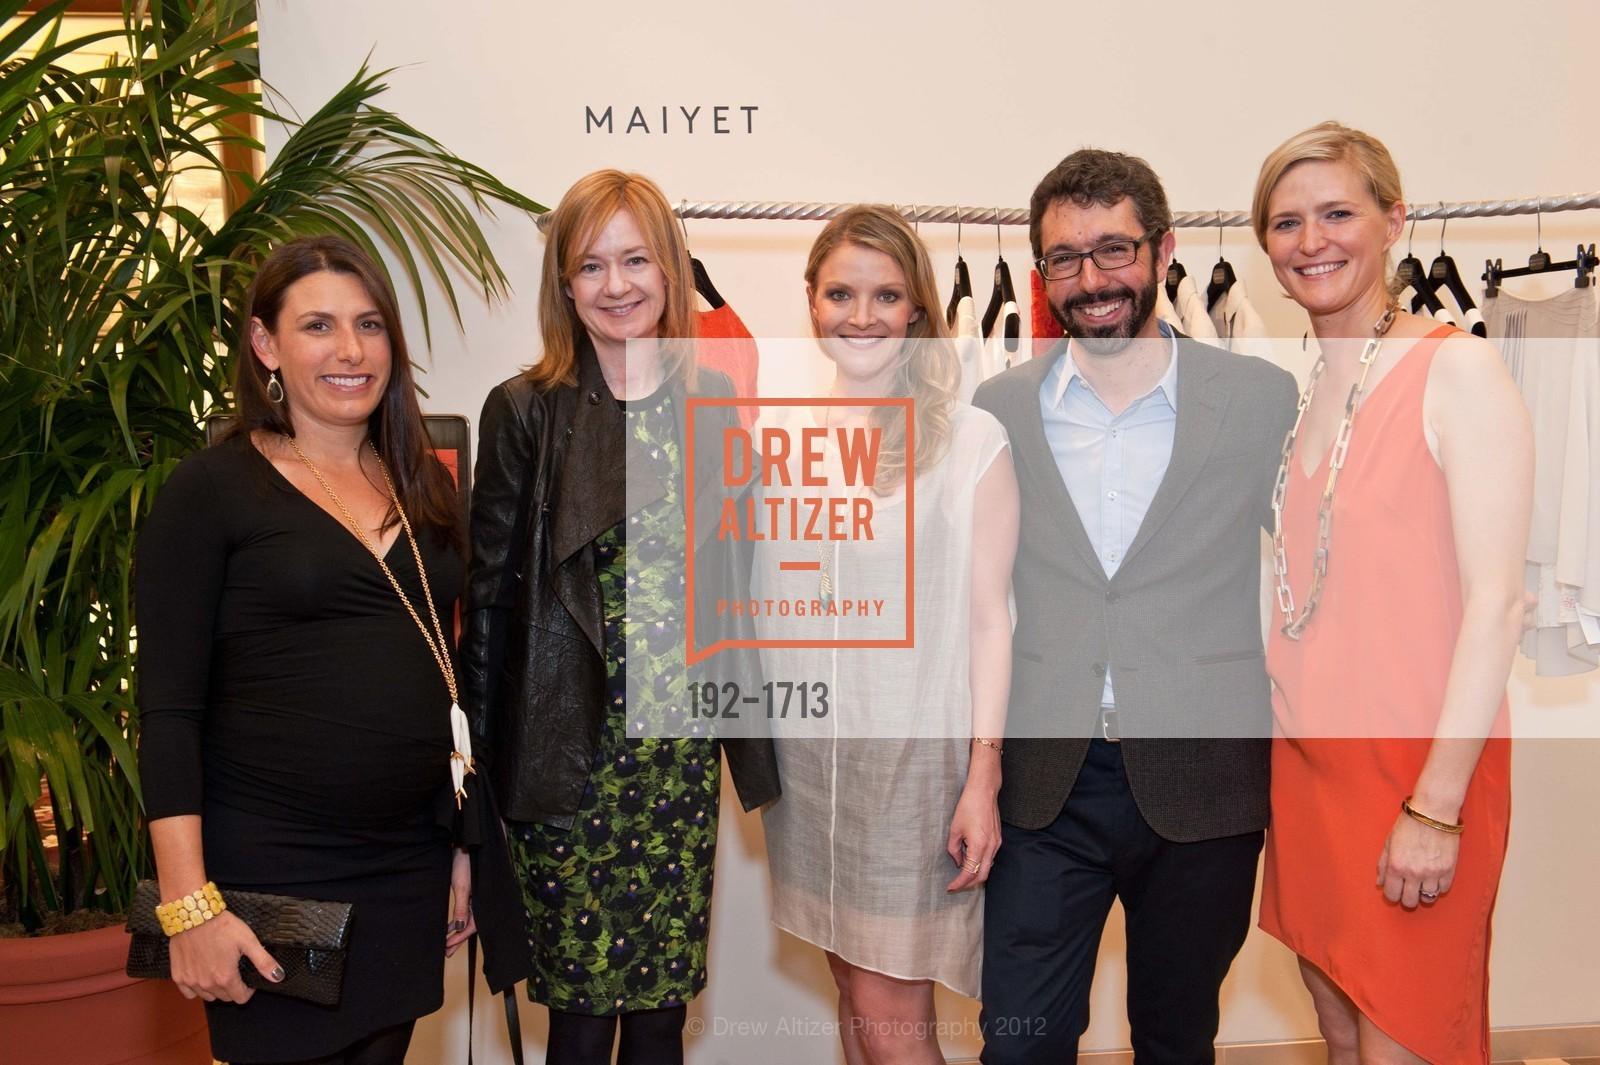 Julie Meyer, Katie Page, Kristy Caylor, Paul van Zyl, Alicia Engstrom, Photo #192-1713